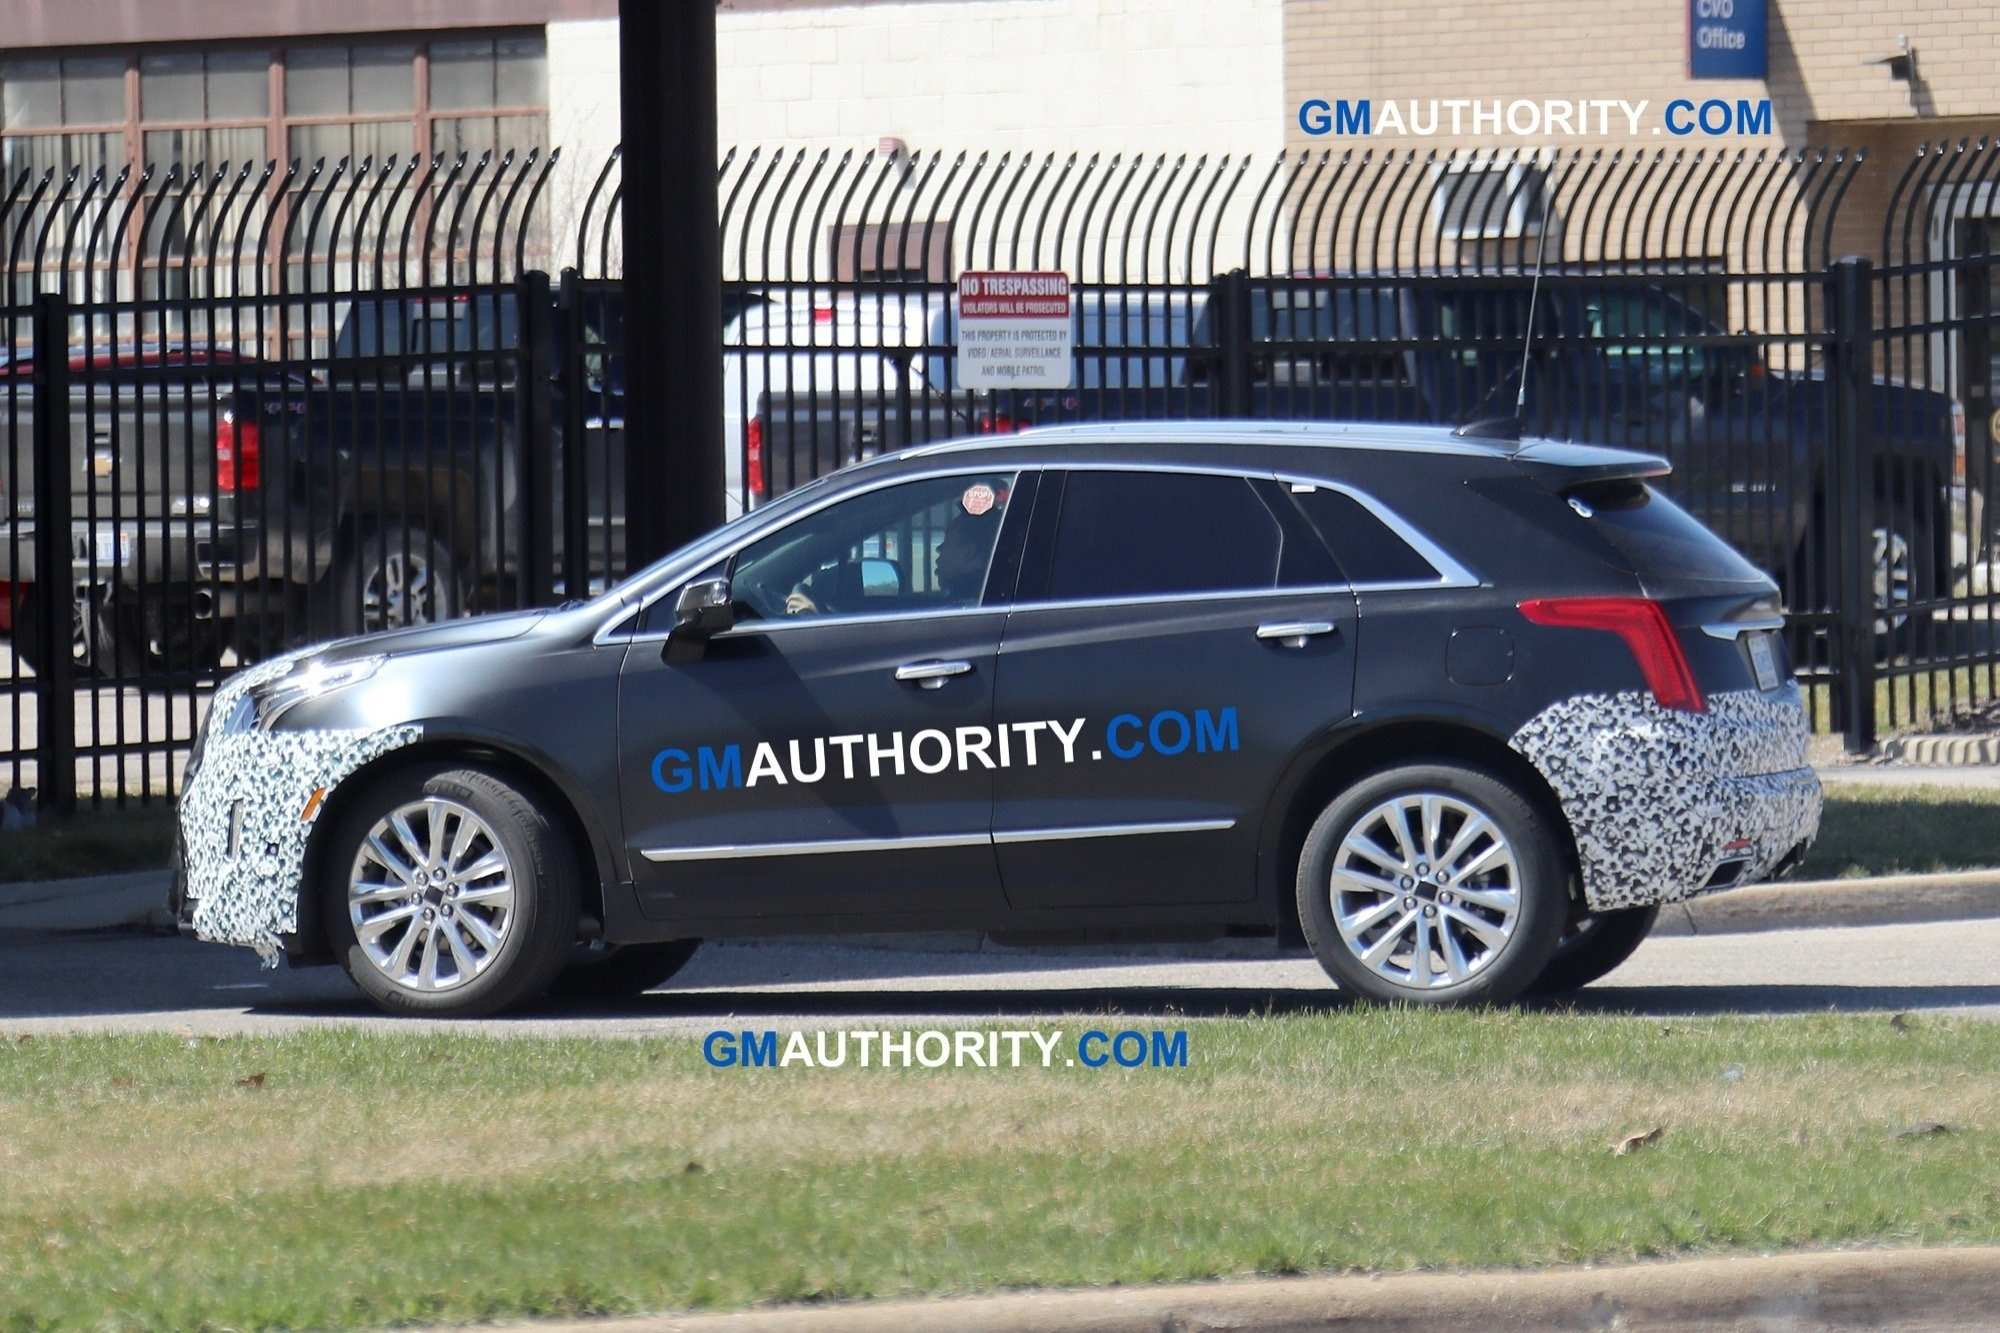 54 Concept of 2019 Spy Shots Cadillac Xt5 Configurations with 2019 Spy Shots Cadillac Xt5